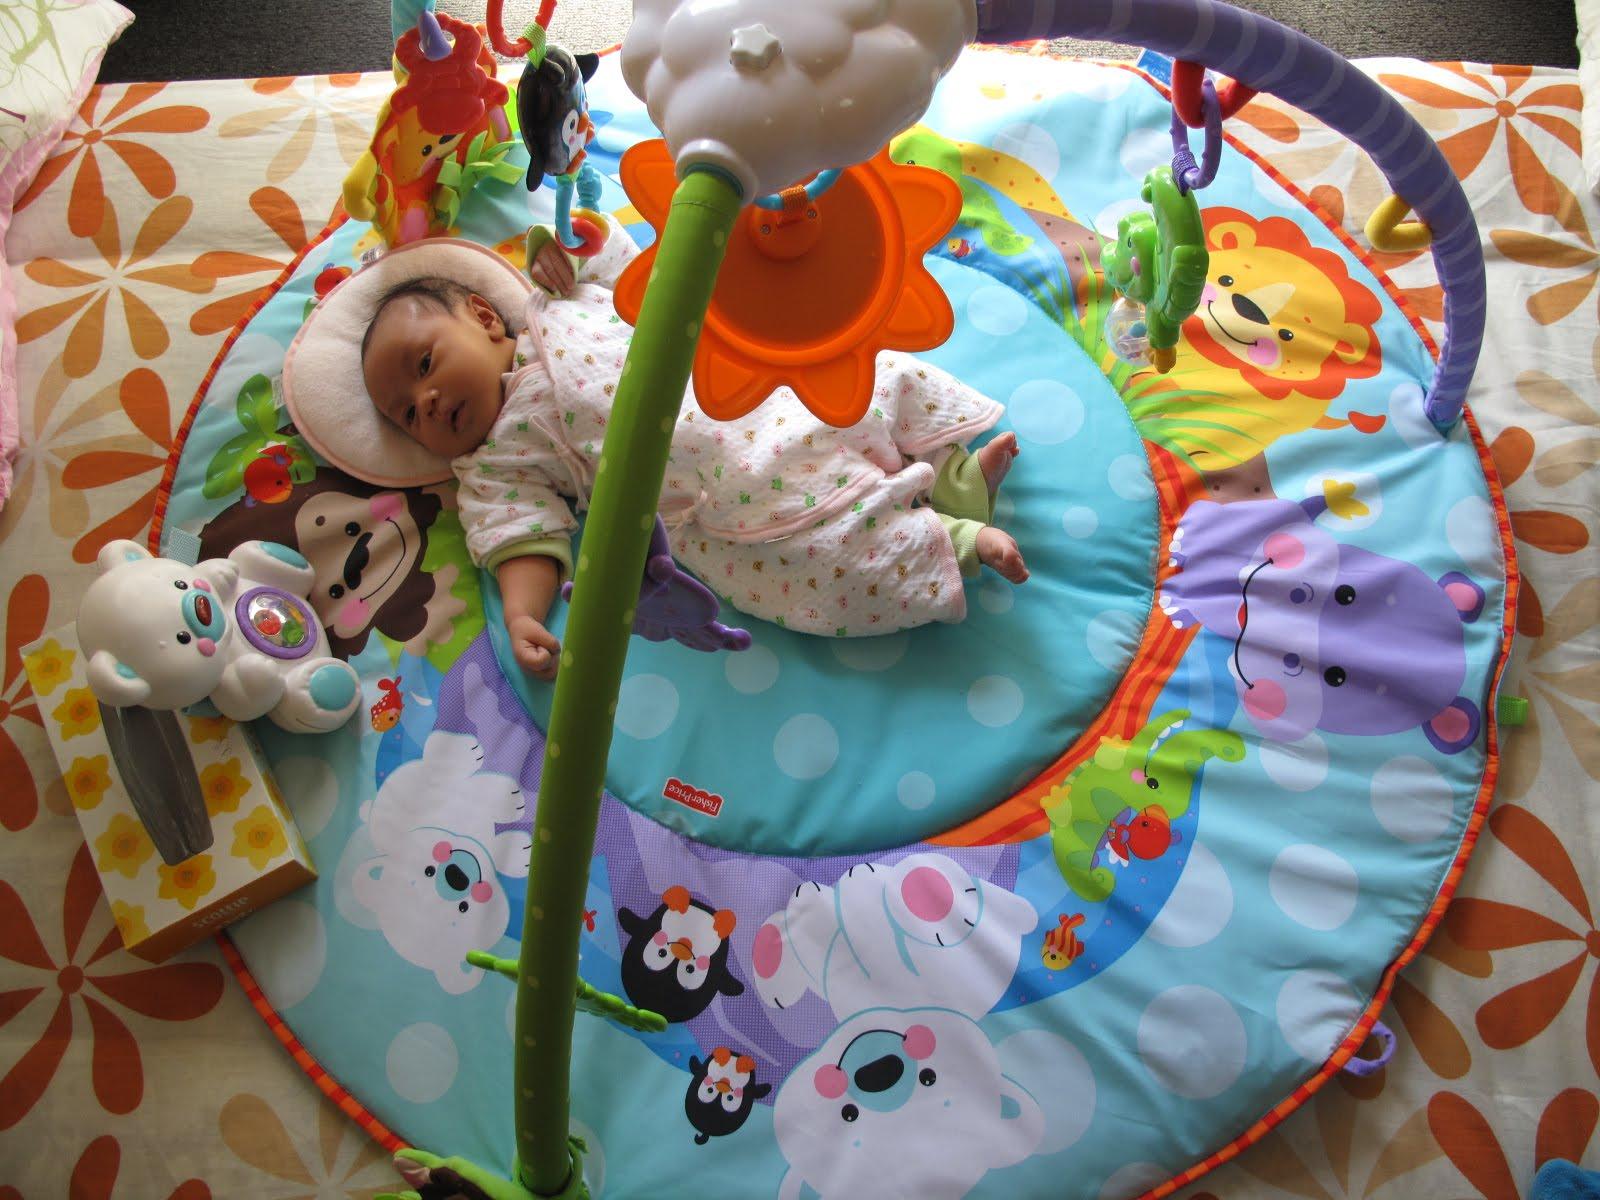 Kemaren dapet hadiah mainan dari Om Yusuf Mainannya bagus dan lucu Benika suka ban tuh Trus mamah Benika juga beliin mainan buat di baby box nya